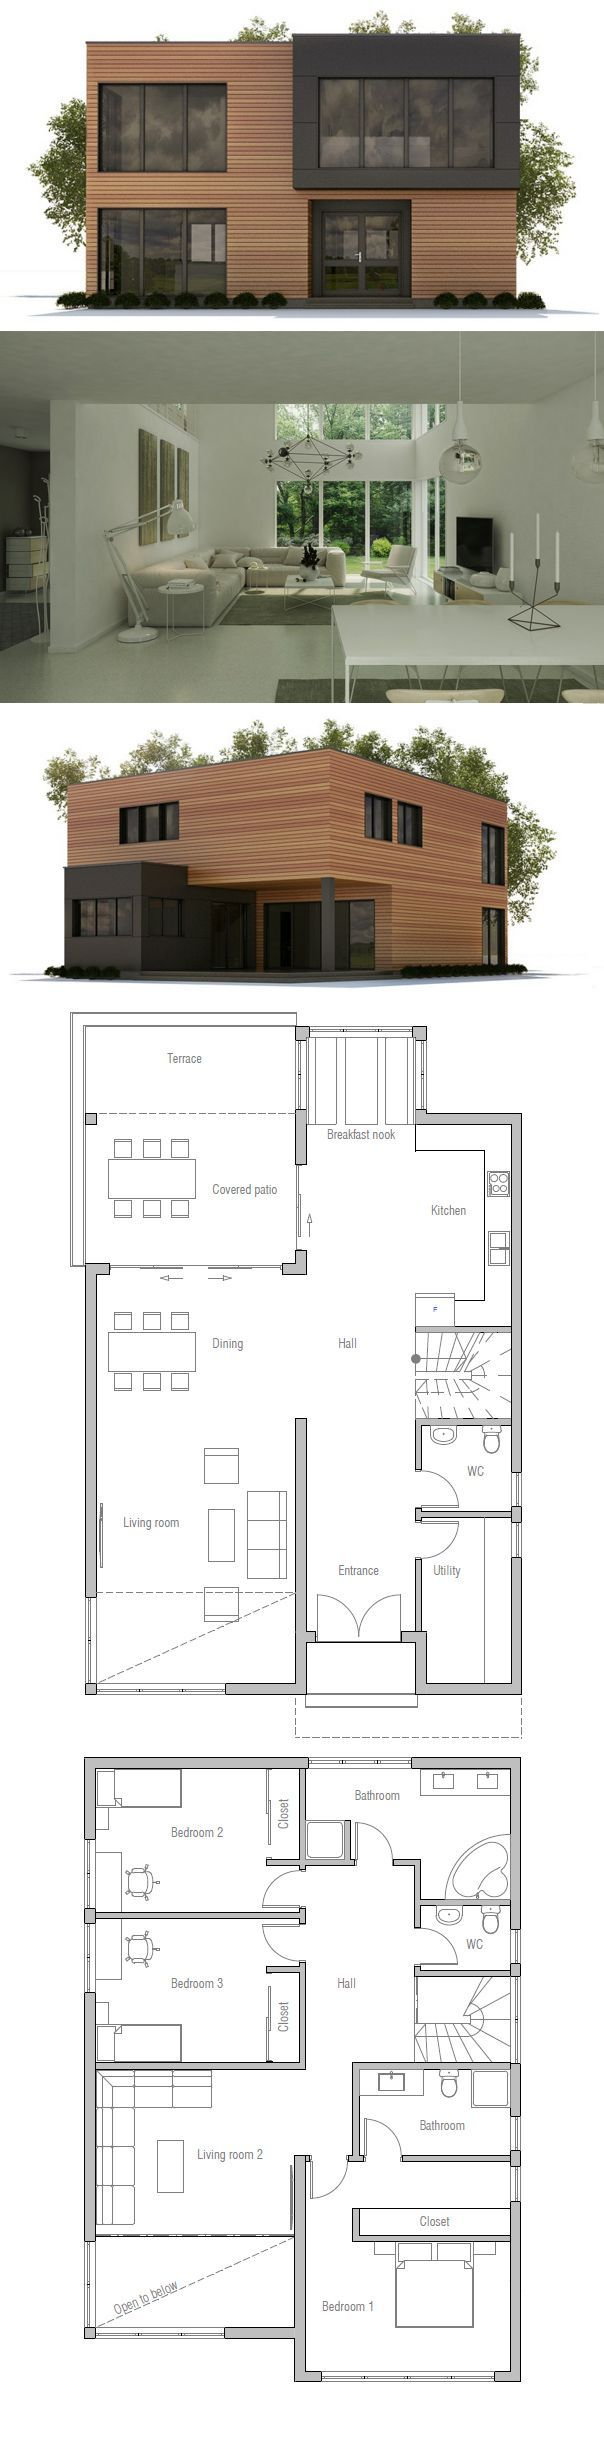 Hauspläne modern  Hausplan, TOP 20 Hauspläne | проекты | Pinterest | House ...